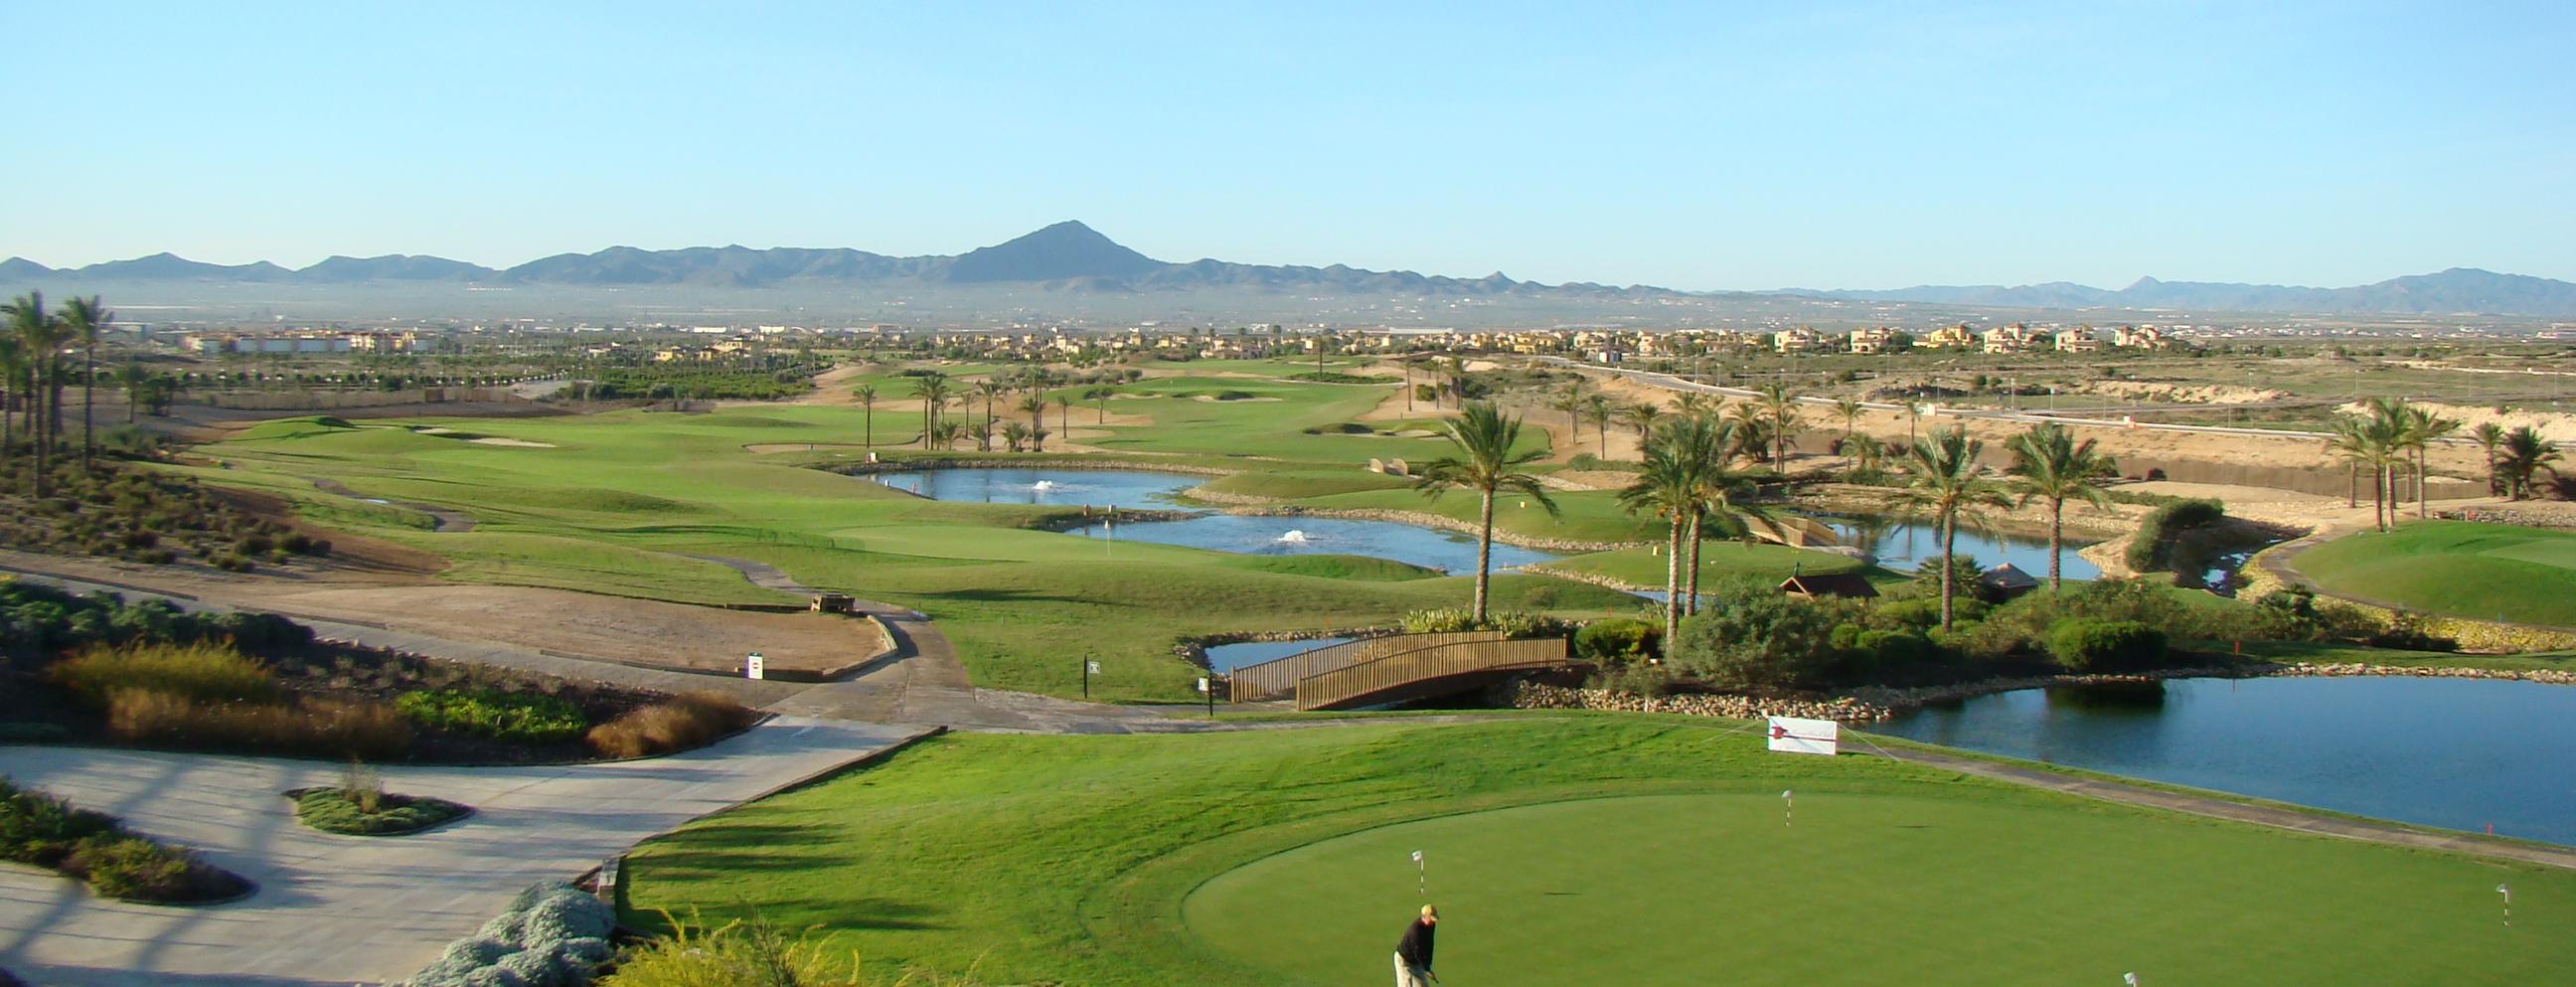 Golf_Course_views_204